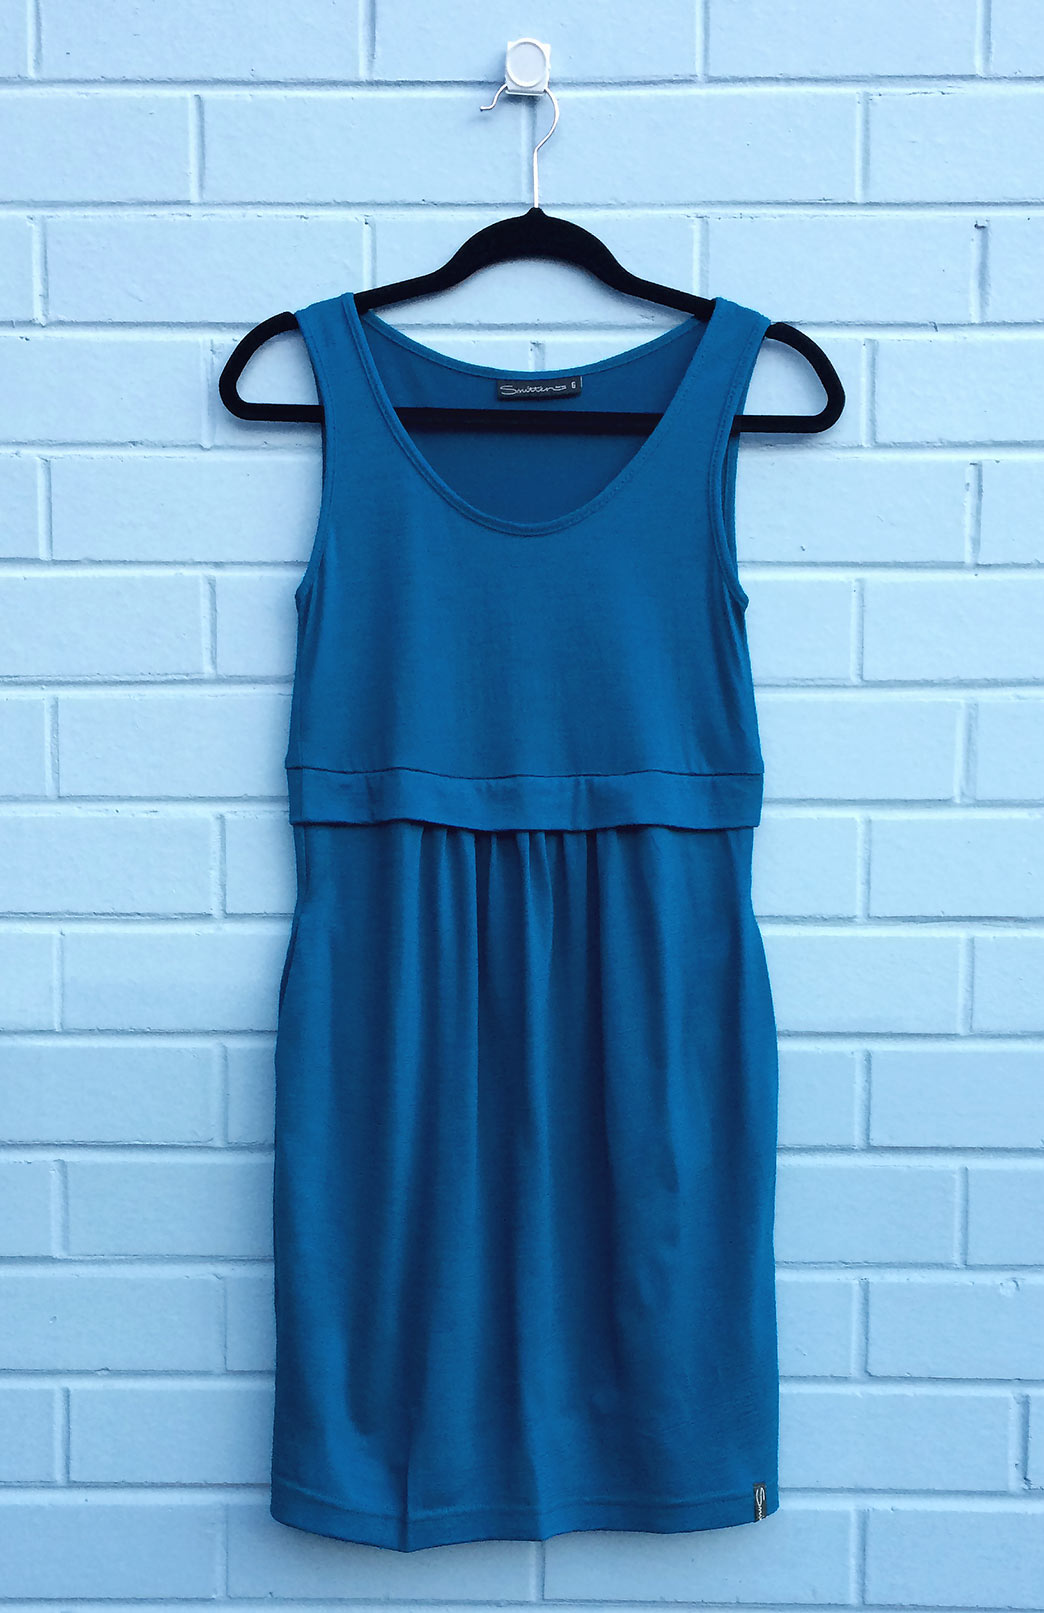 Tulip Dress - Women's Teal Merino Wool Fitted Tulip Dress with Side Pockets - Smitten Merino Tasmania Australia